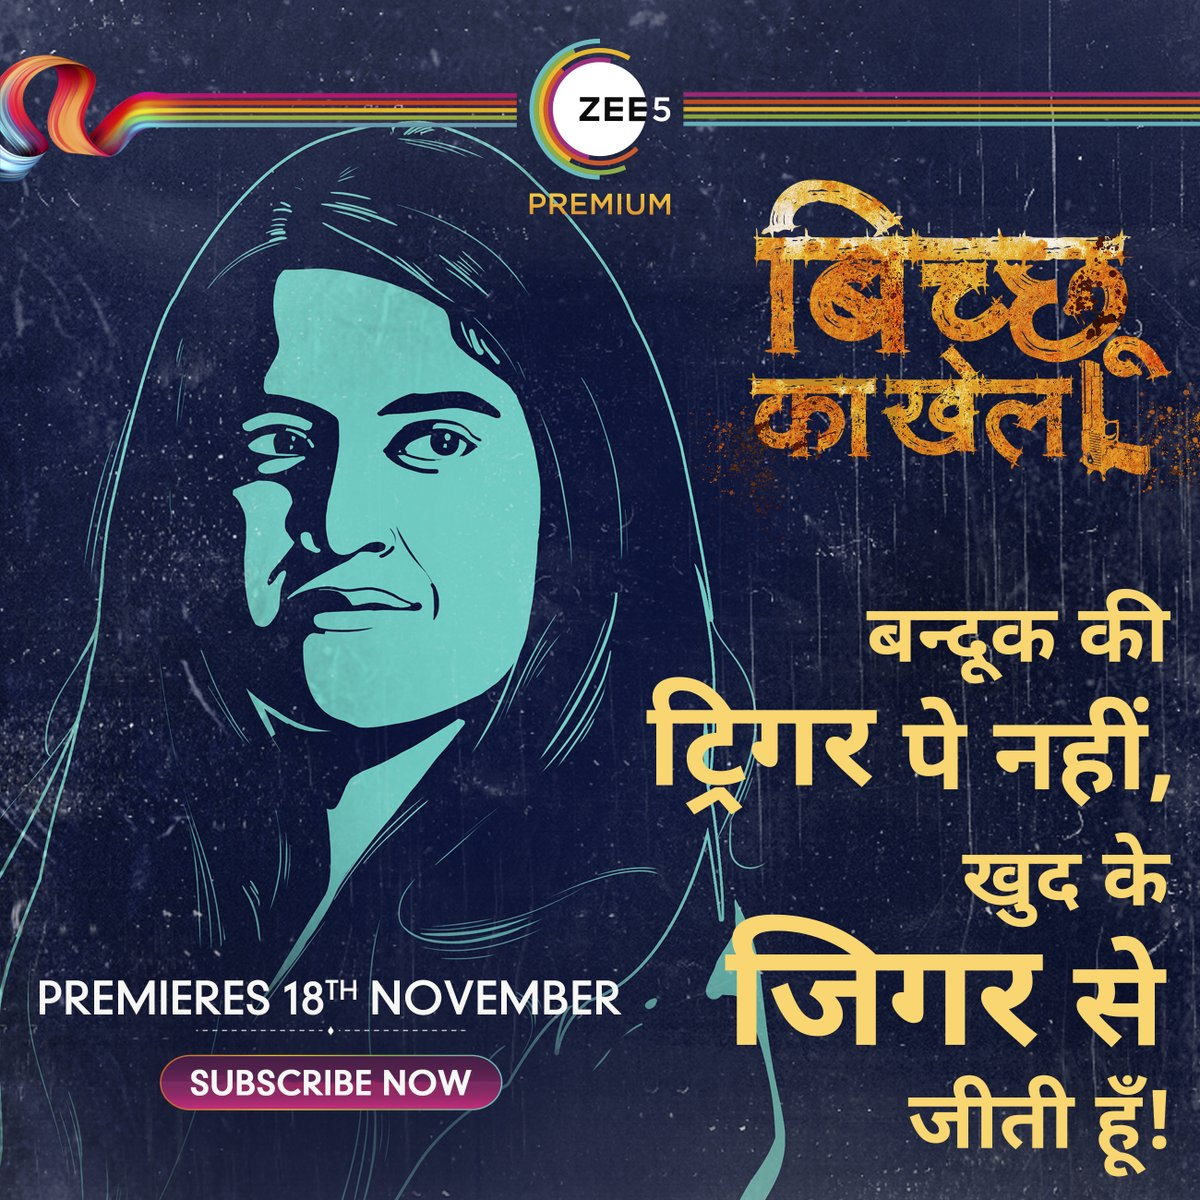 Toh humse seekhiye, test na keejiya!  #BichooKaKhel Premieres 18th November. https://t.co/g1Dz7AuiJy